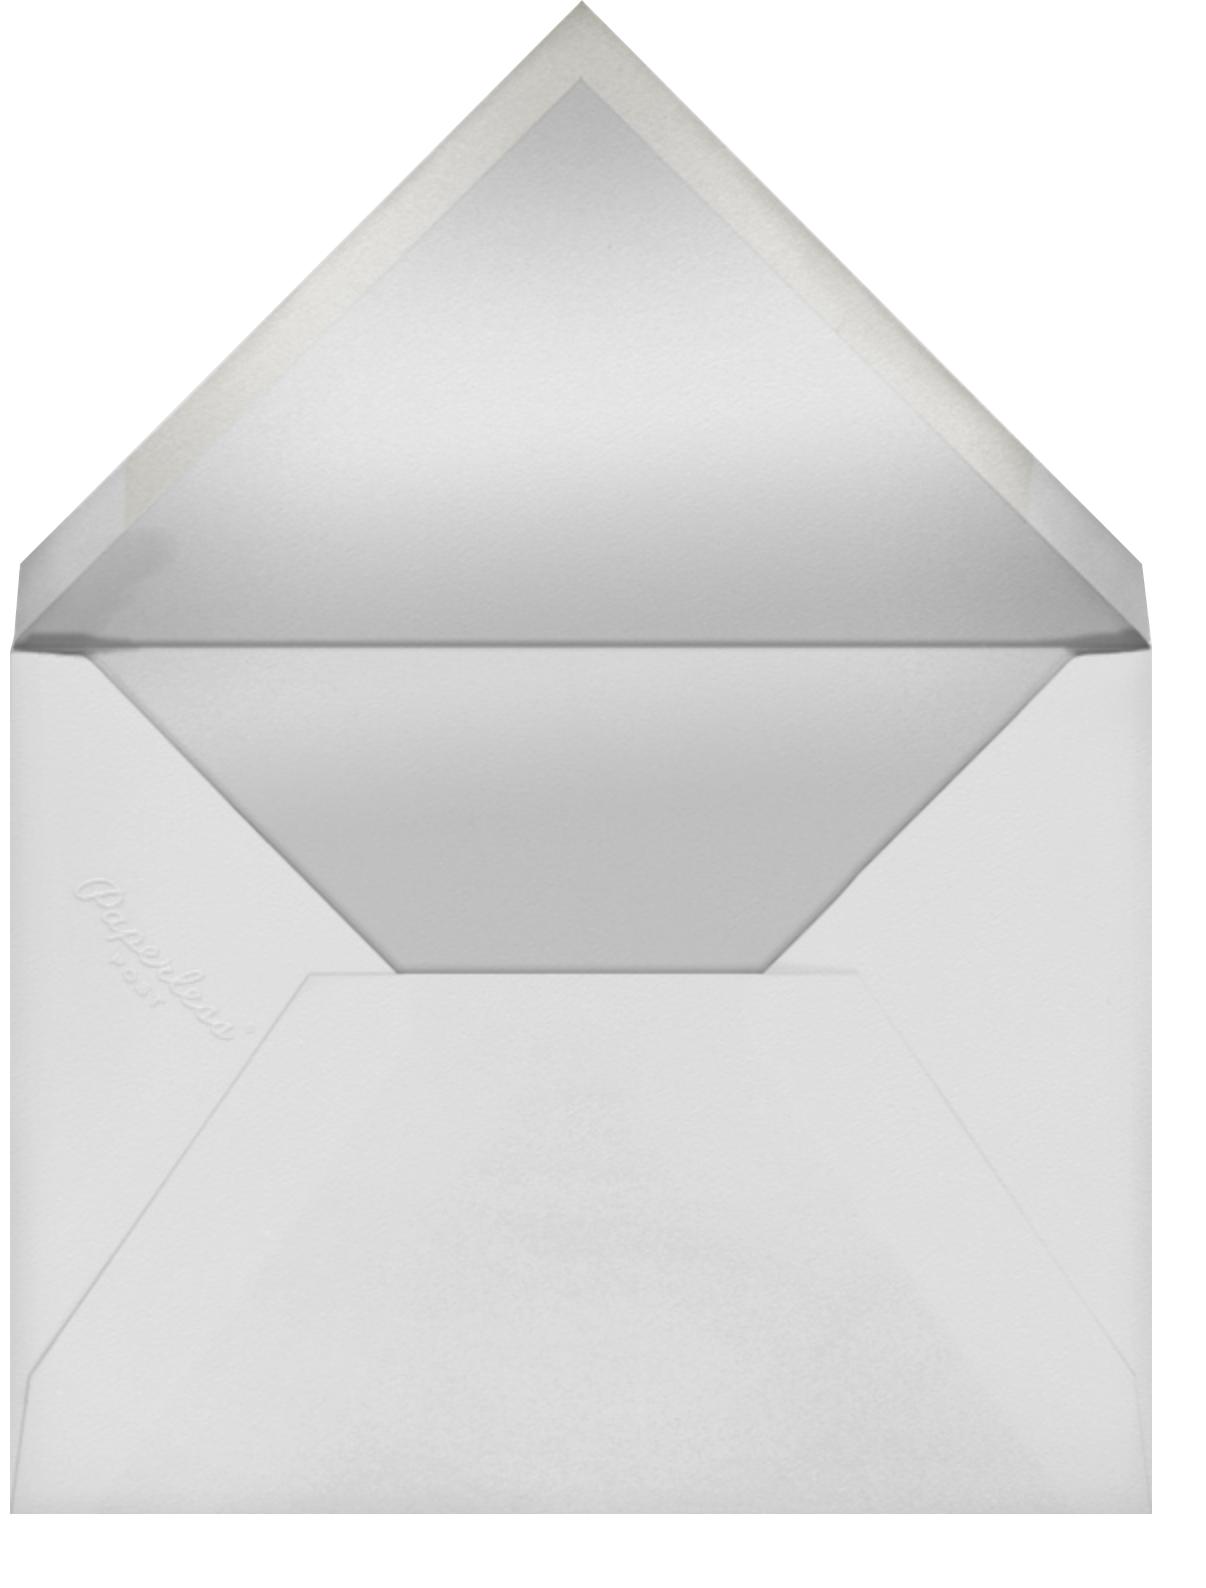 Spiral - Paperless Post - Sports - envelope back